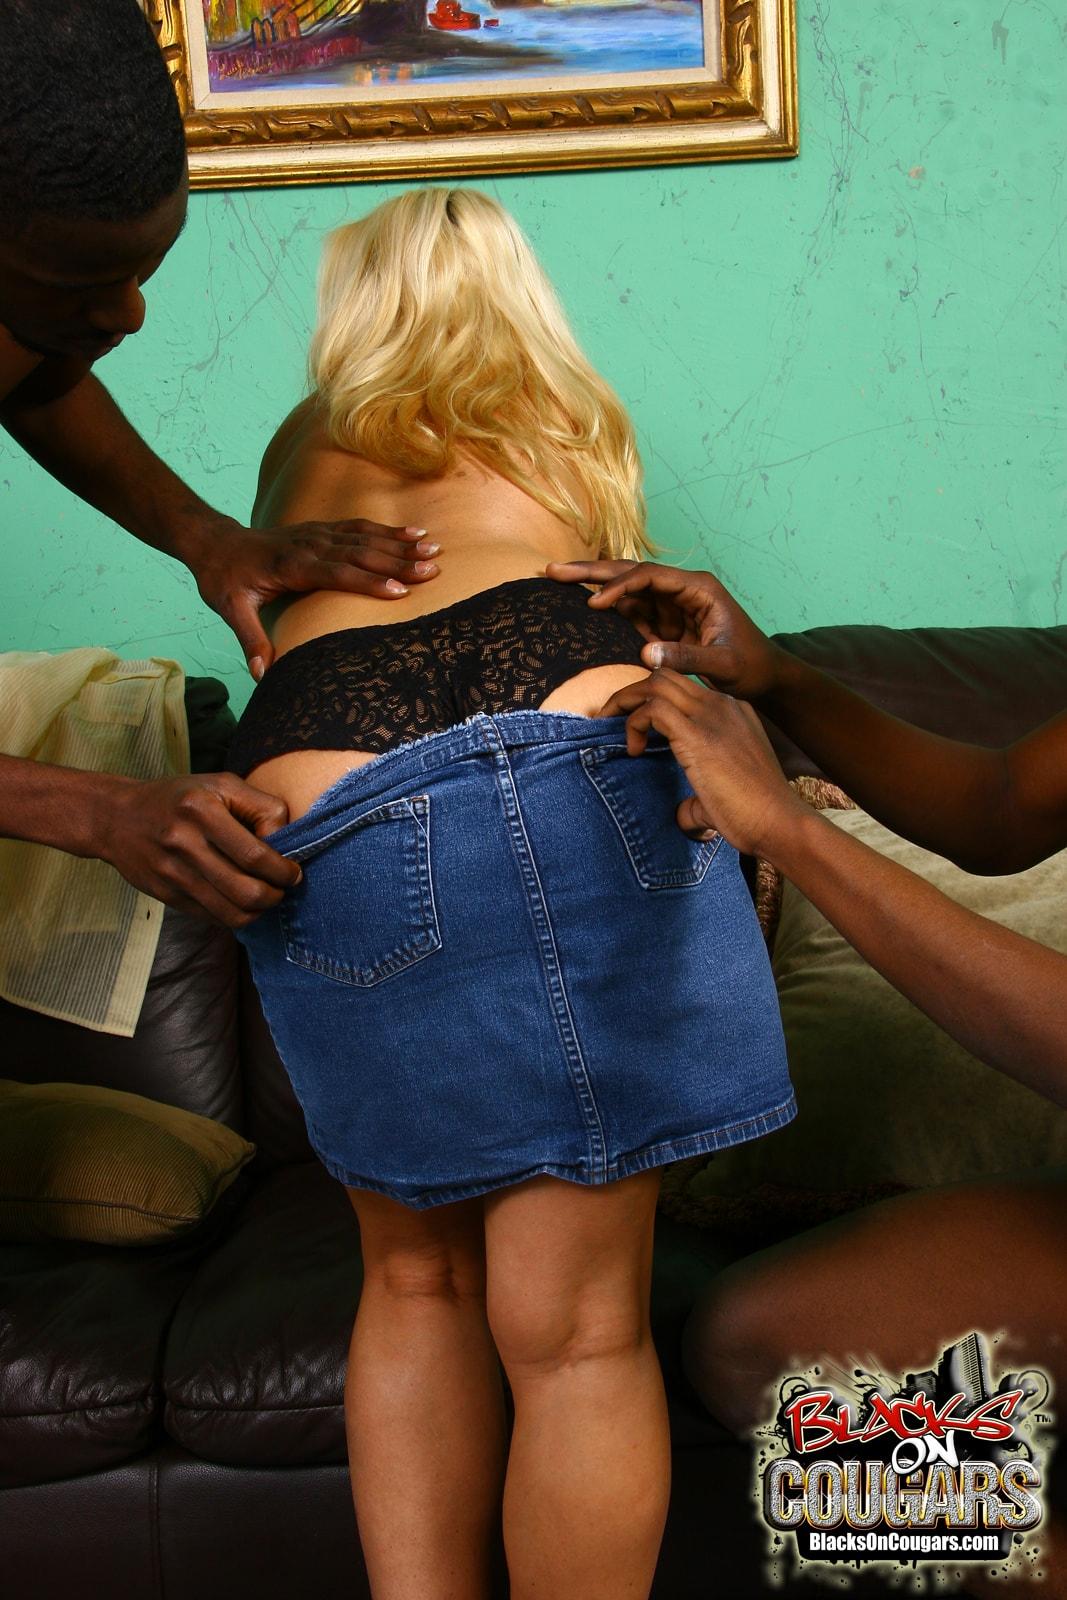 Dogfart '- Blacks On Cougars' starring Cala Craves (Photo 17)